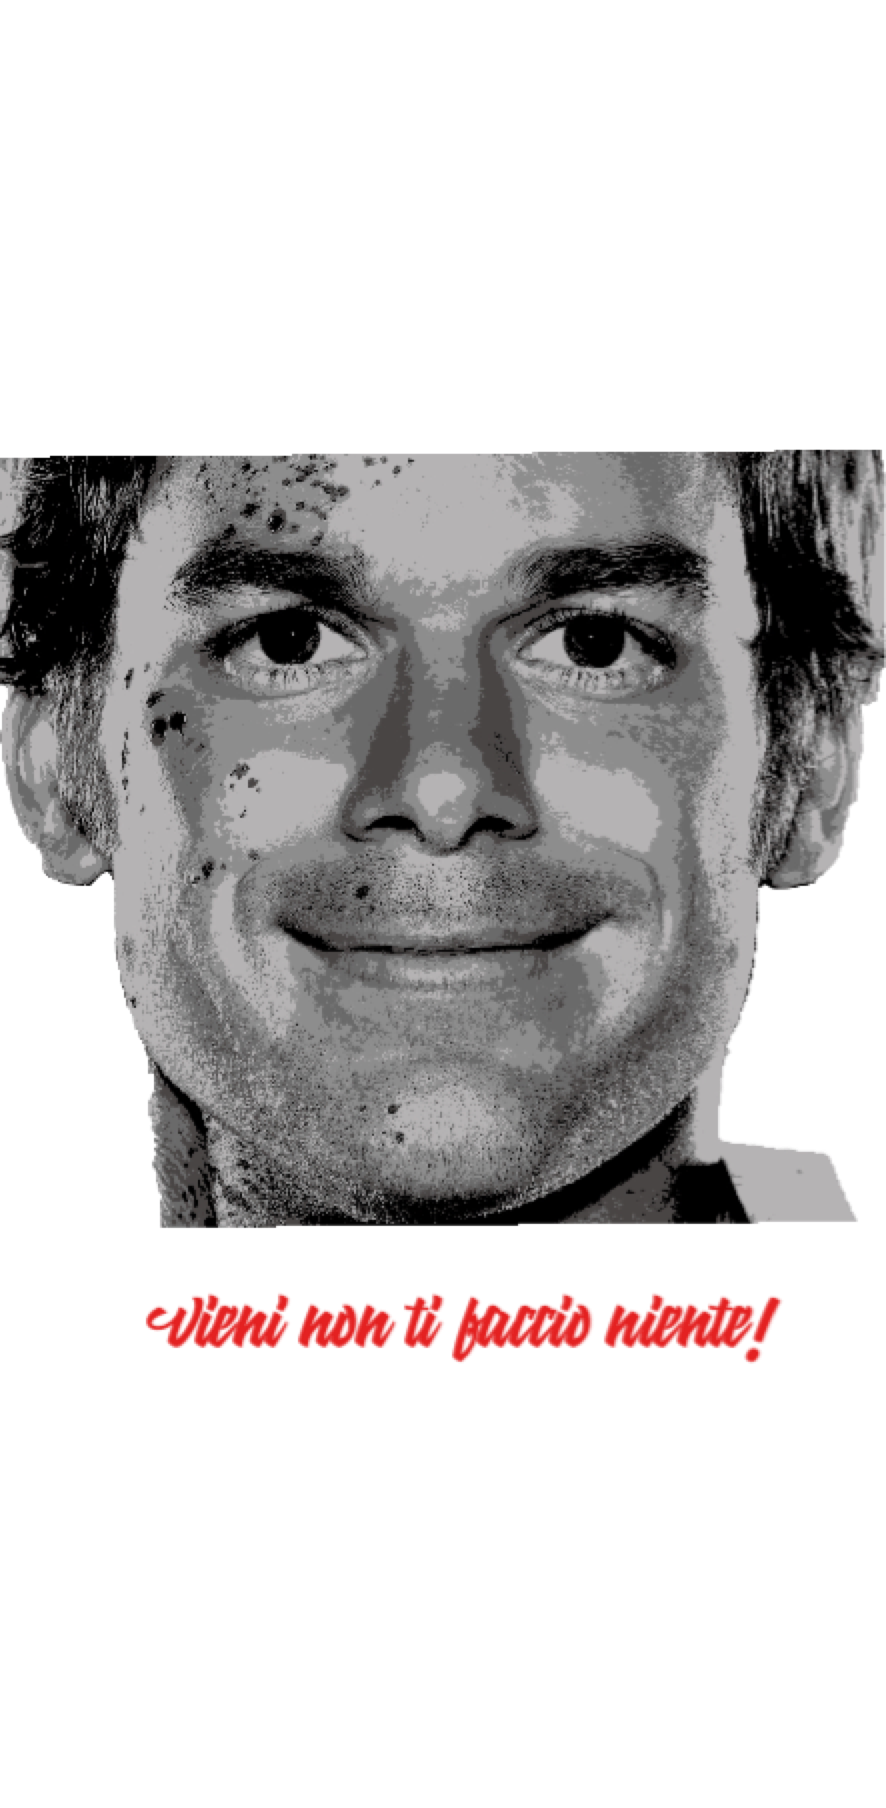 cover #Dexter